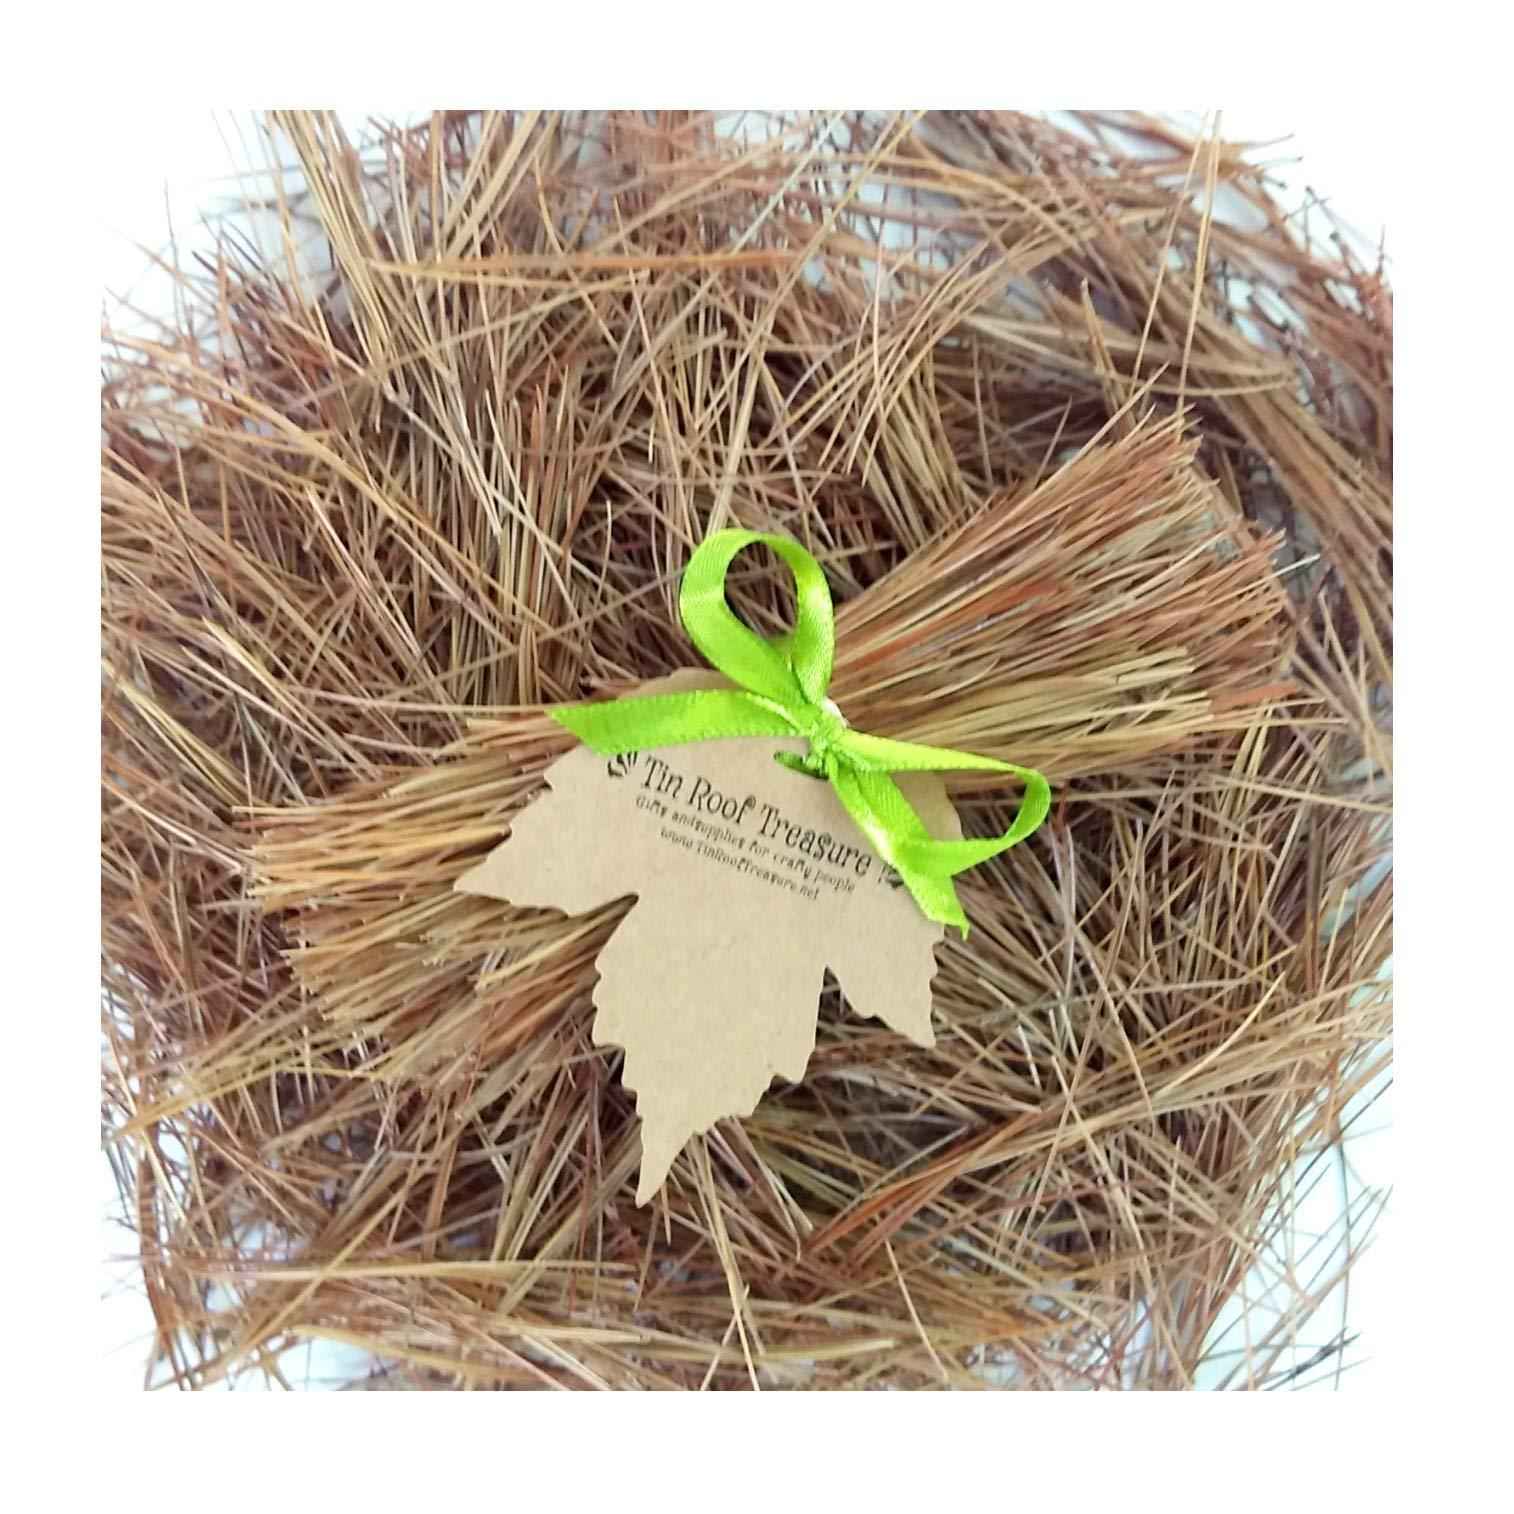 Tin Roof Treasure Naturally Dried Eastern Pine Needles, 8''x10'' Bag